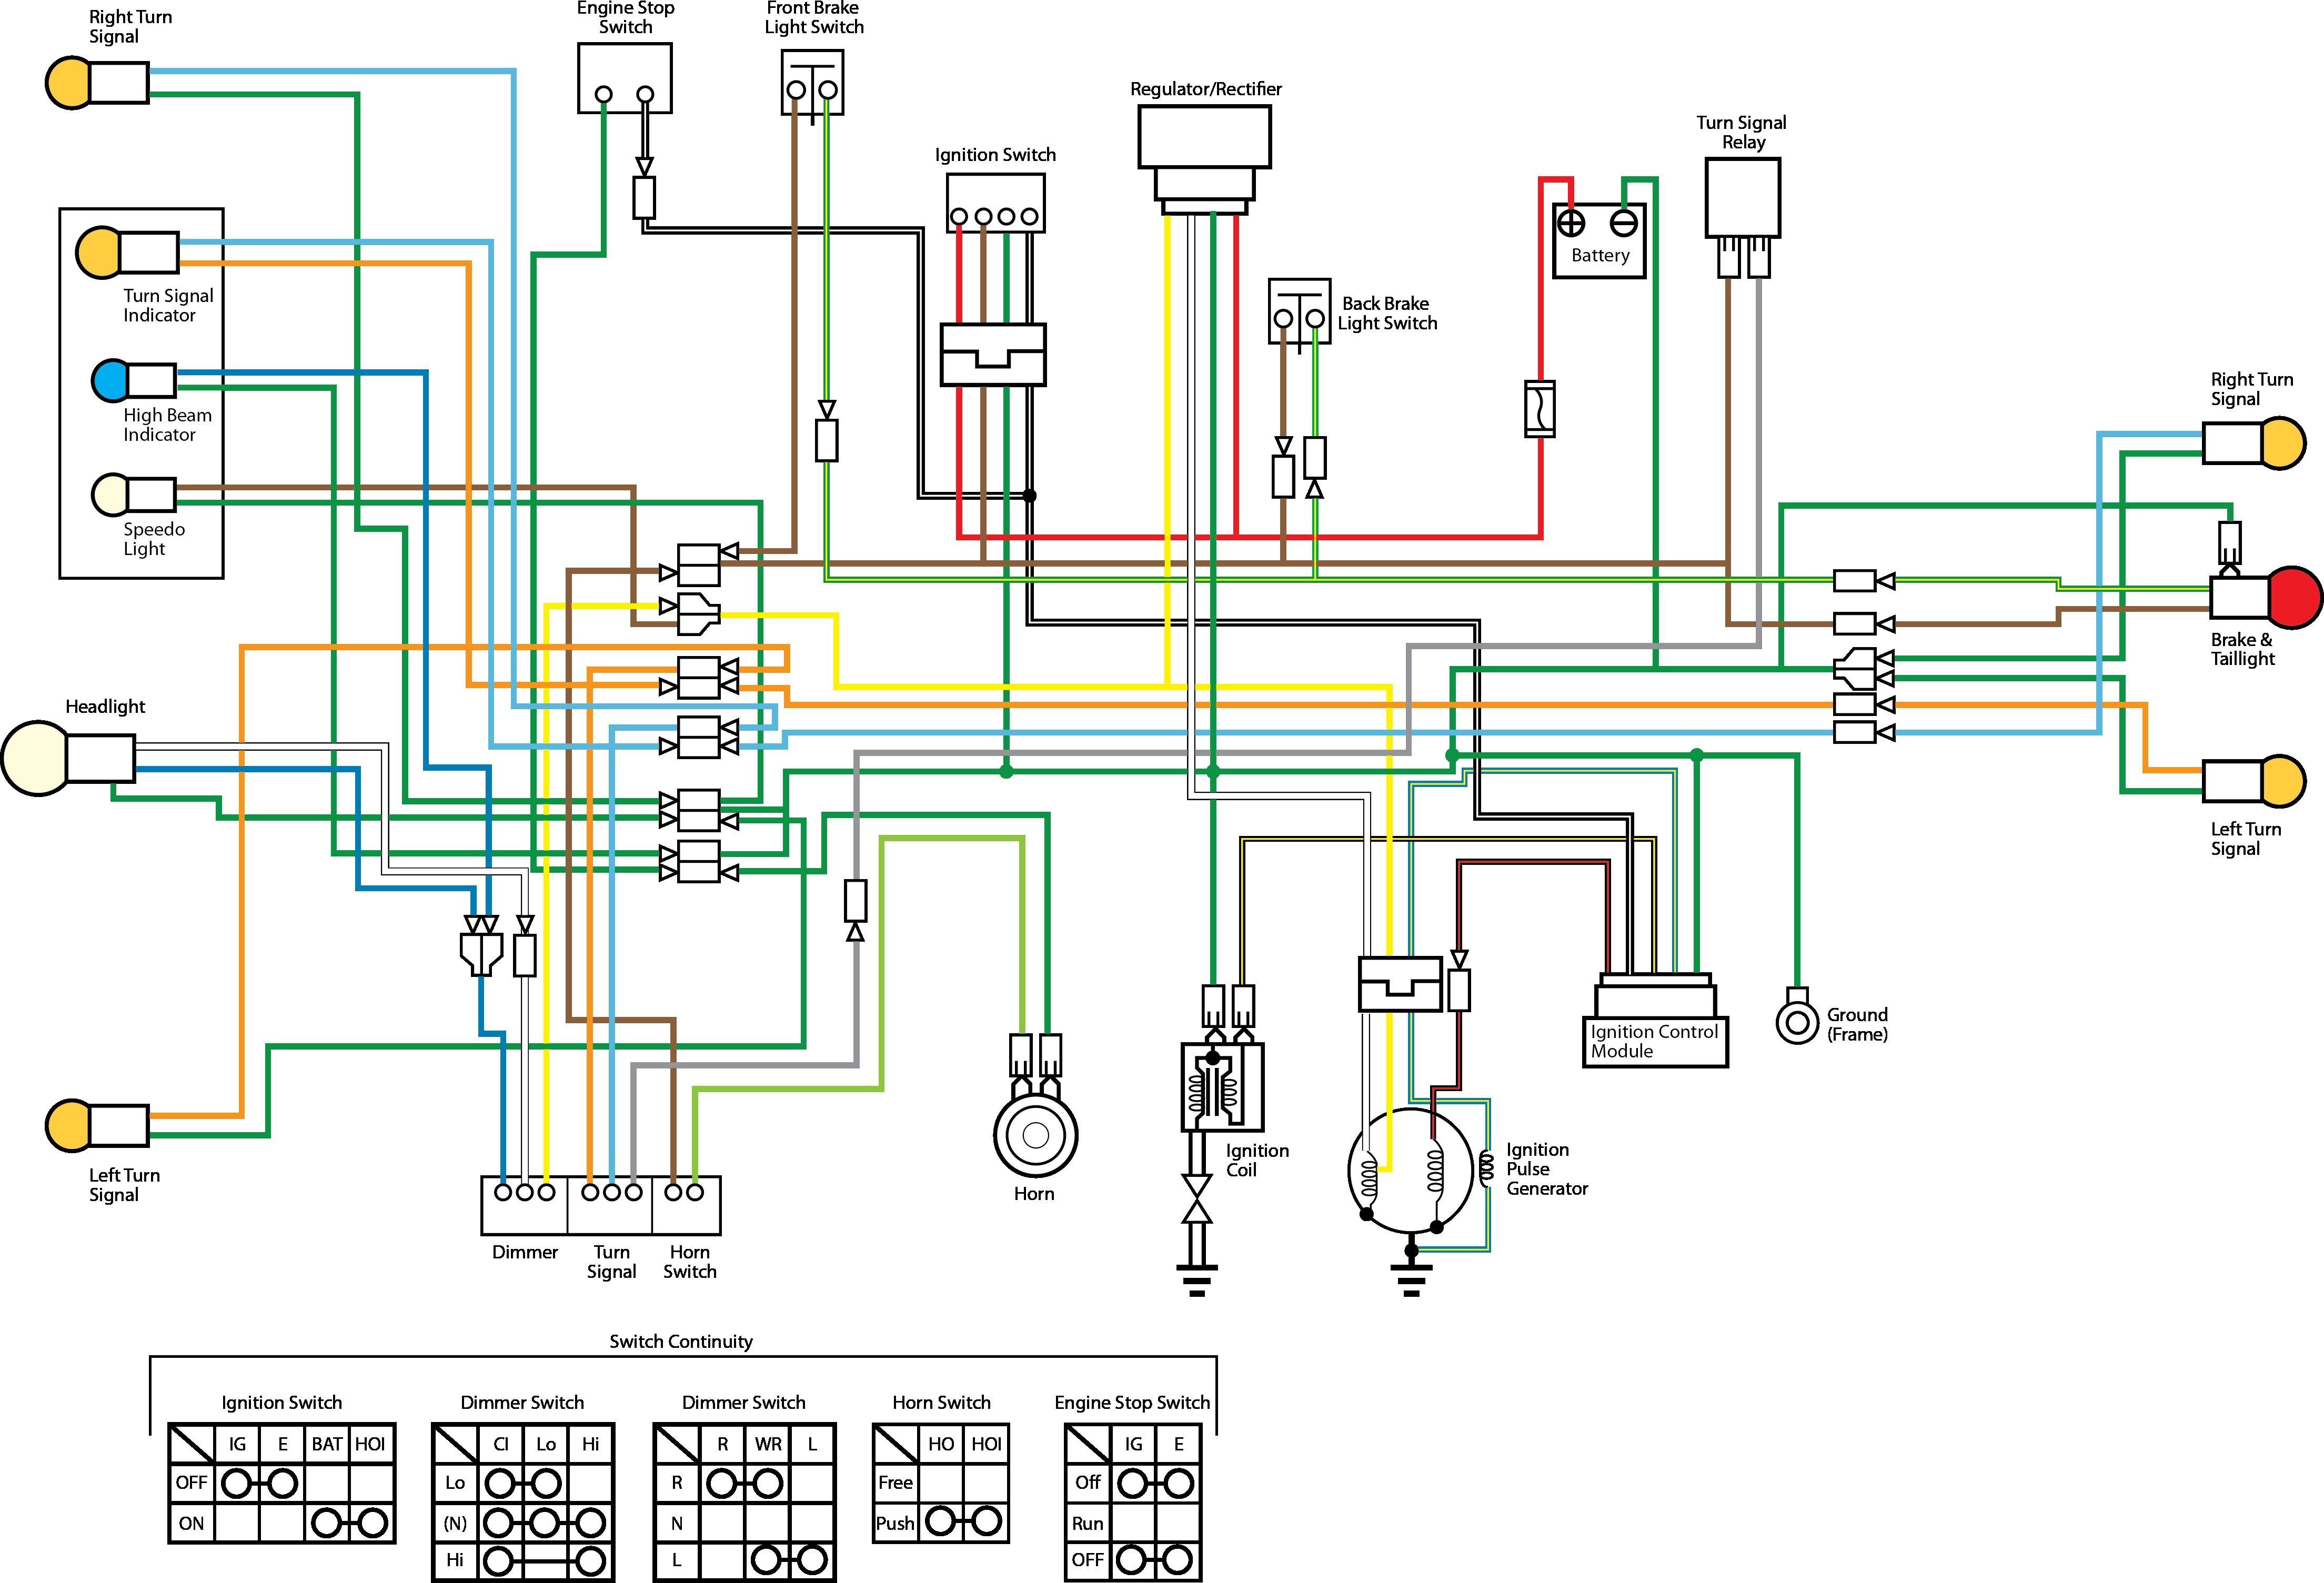 Toyota 22r Engine Diagram 22re Wiring Diagram Of Toyota 22r Engine Diagram toyota Engine Schematics Wiring Diagram Paper